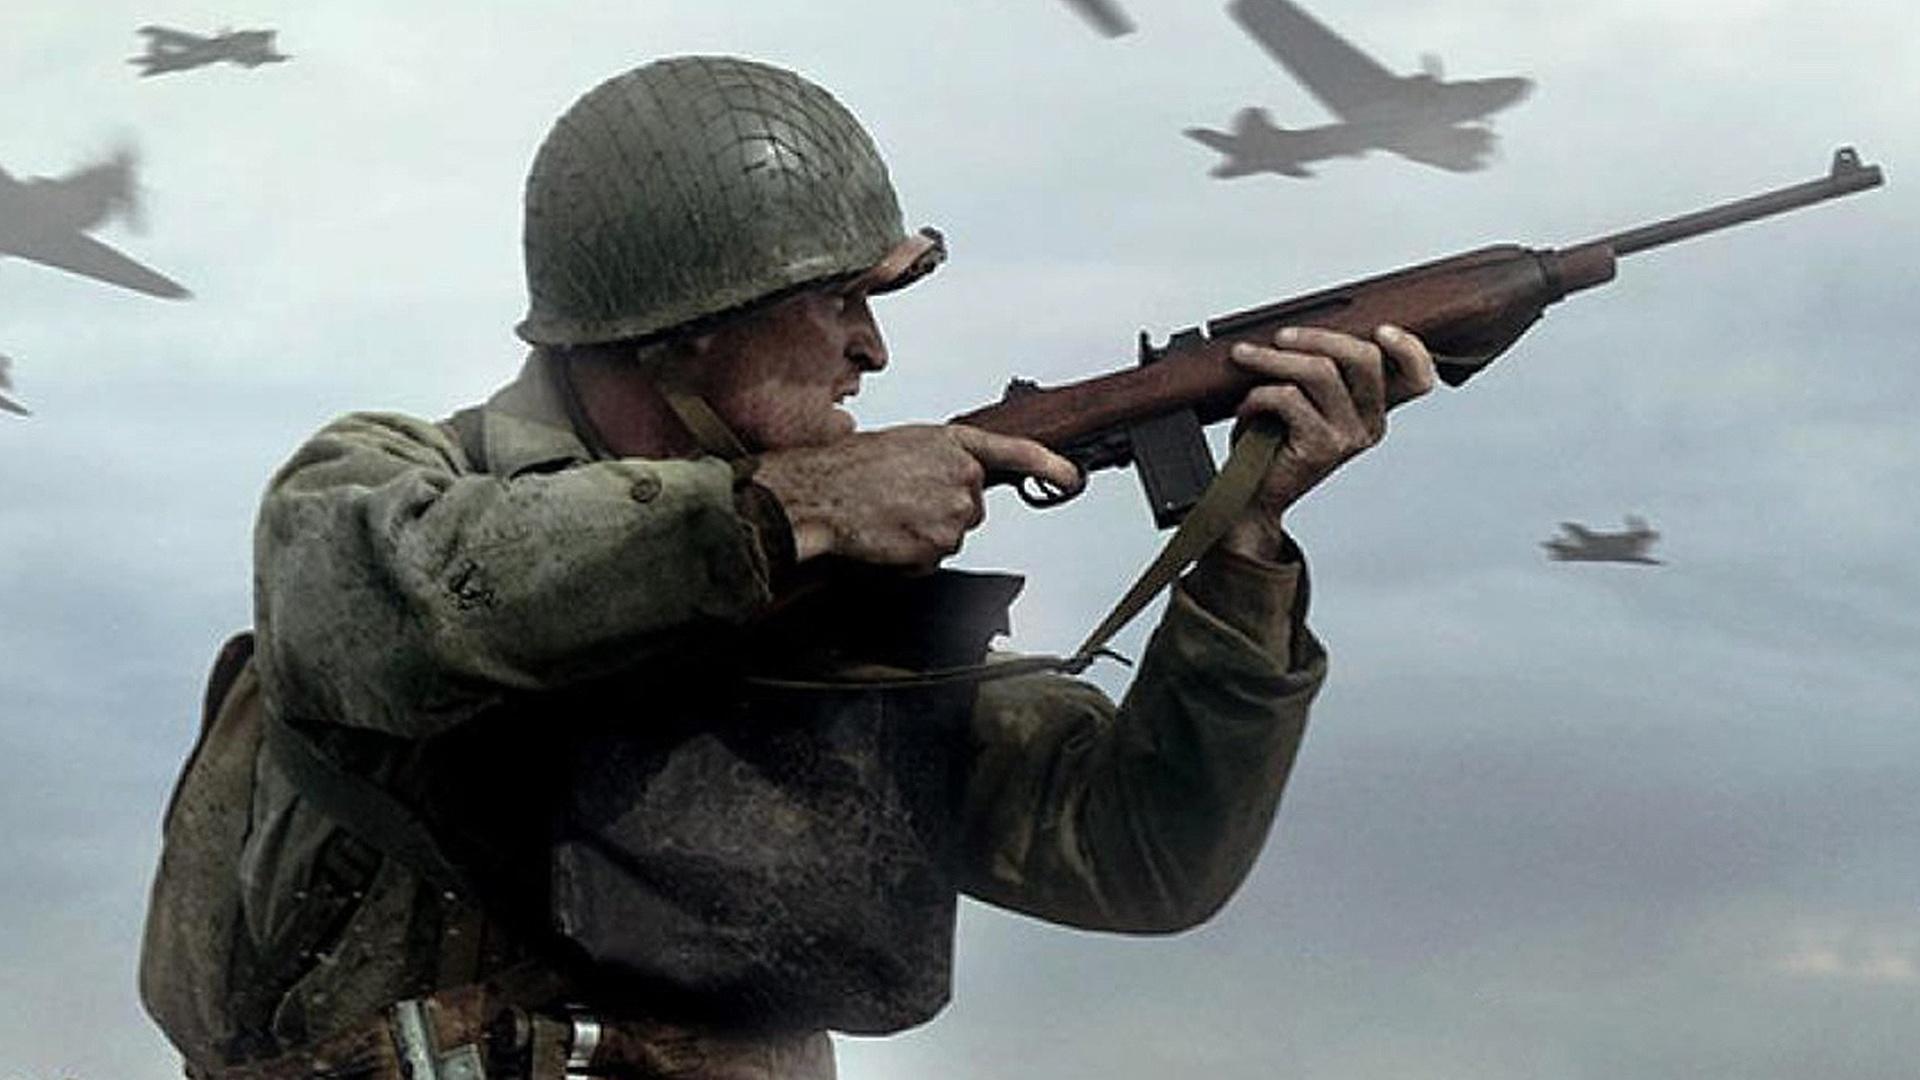 Krieg Spiele